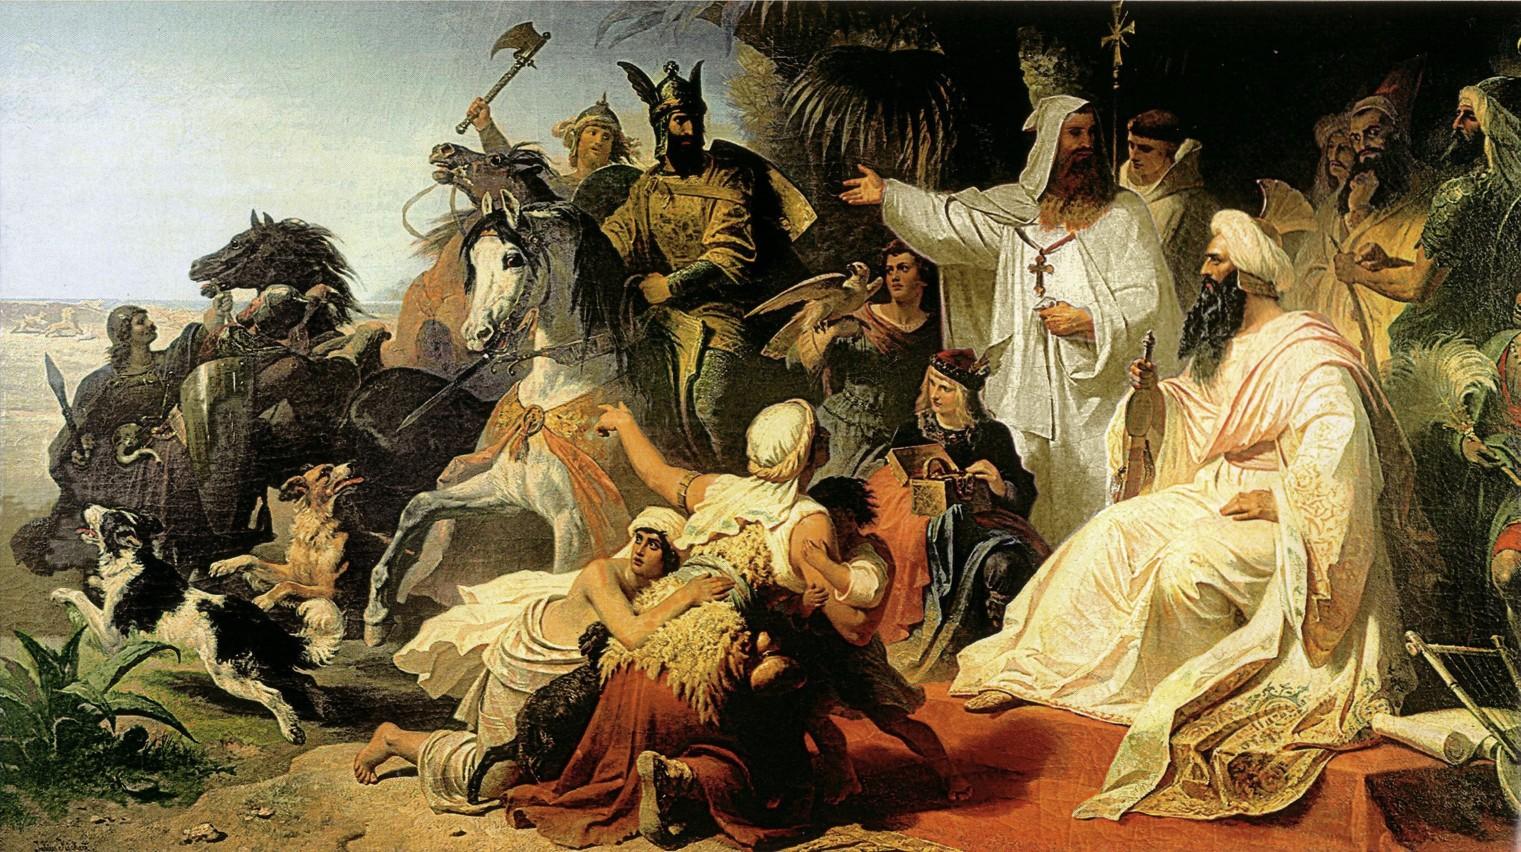 Arab Warrior Ottoman Empire